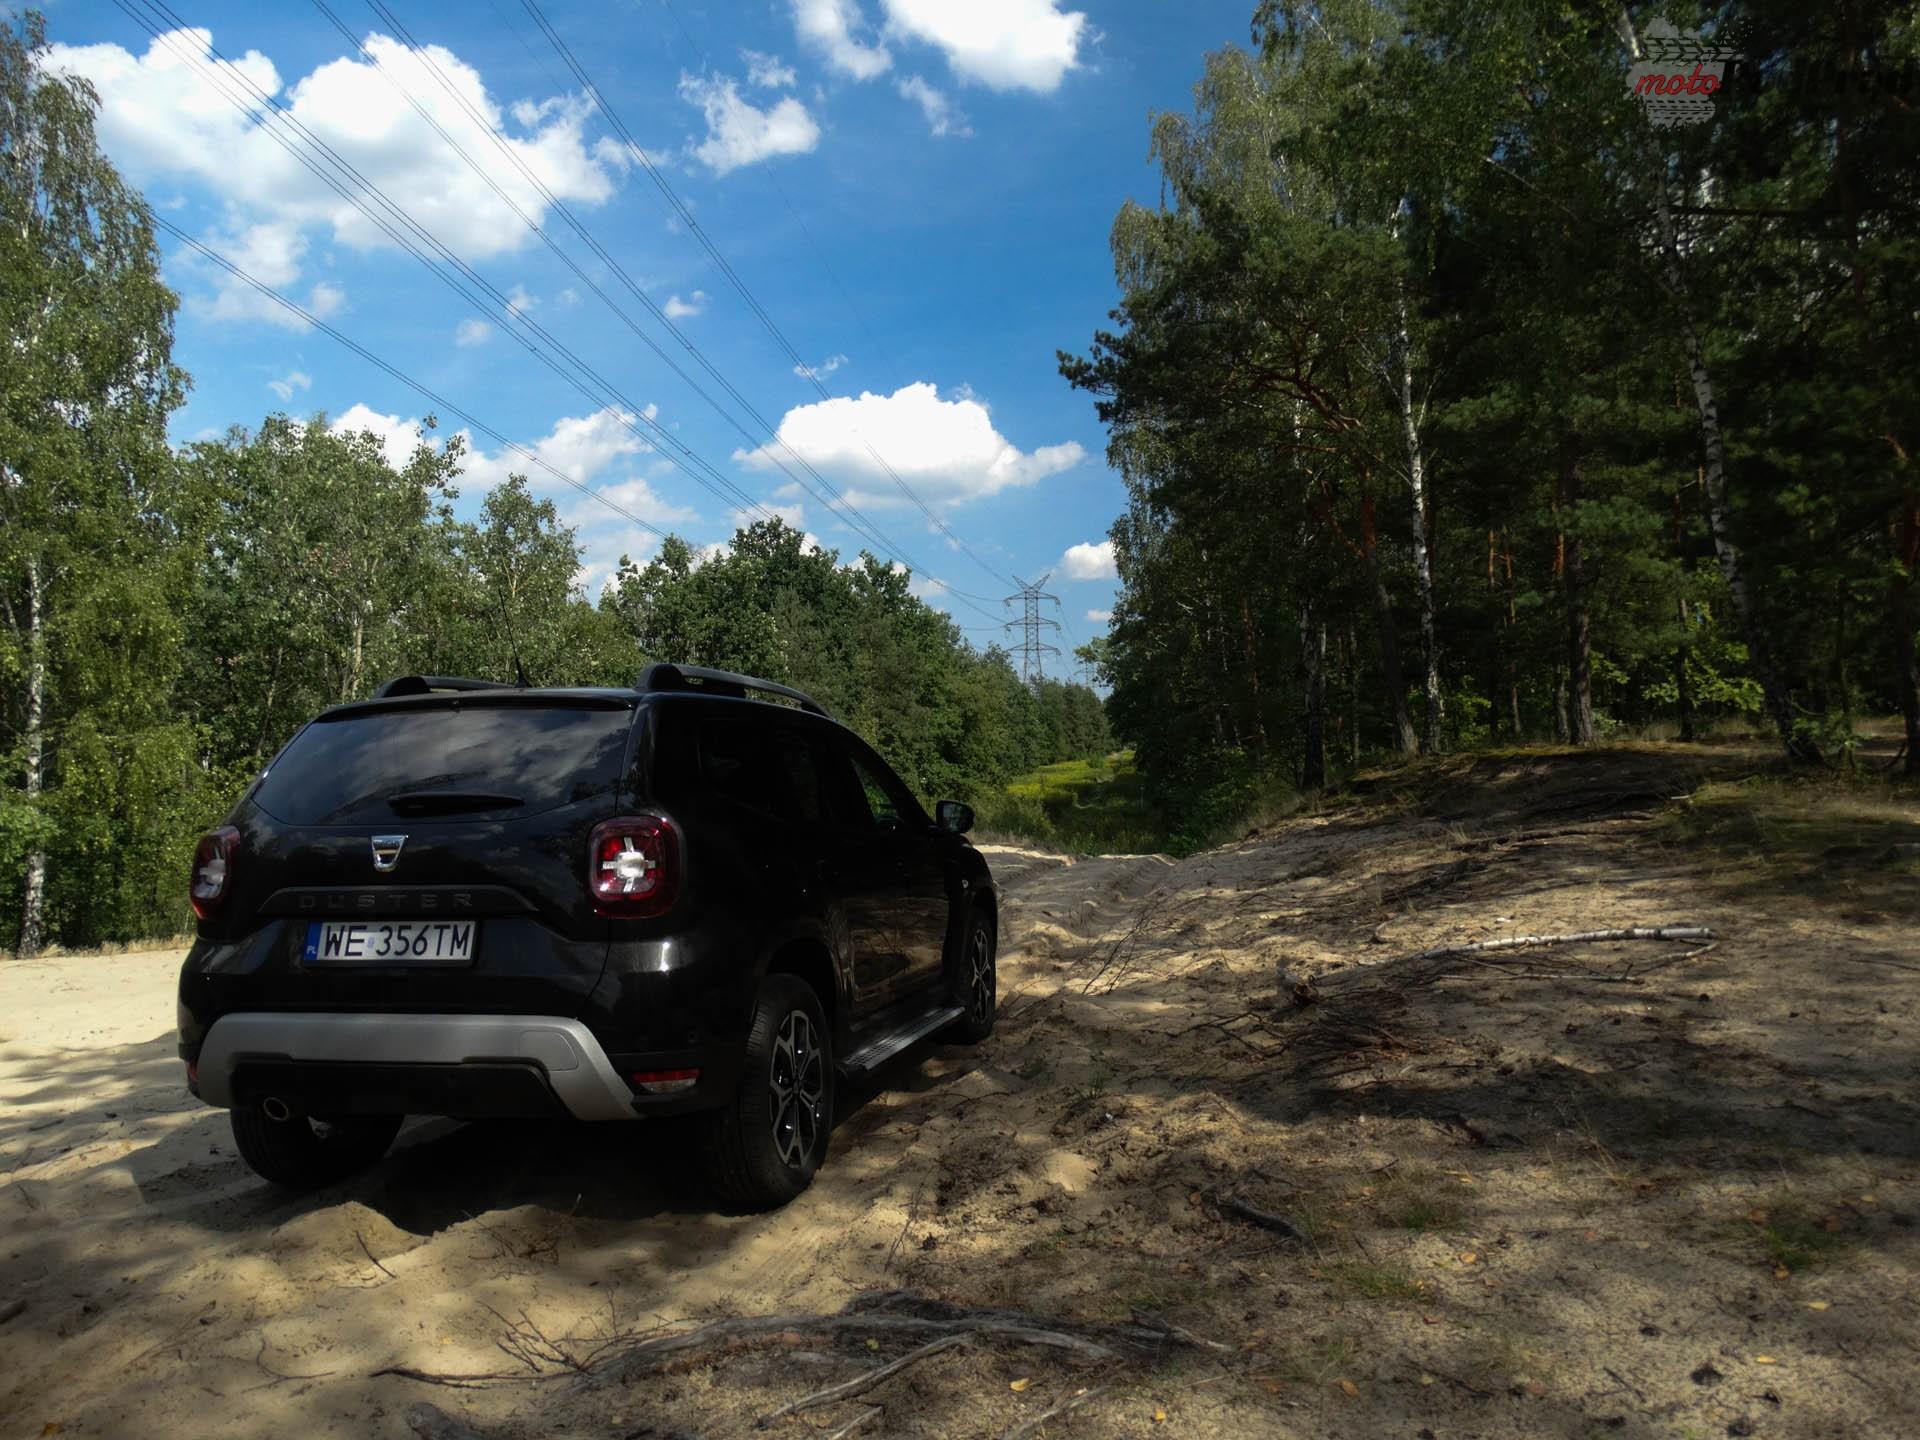 Dacia Duster 9 Test: Dacia Duster PRESTIGE 1.5 dci 4WD – w prostocie siła!